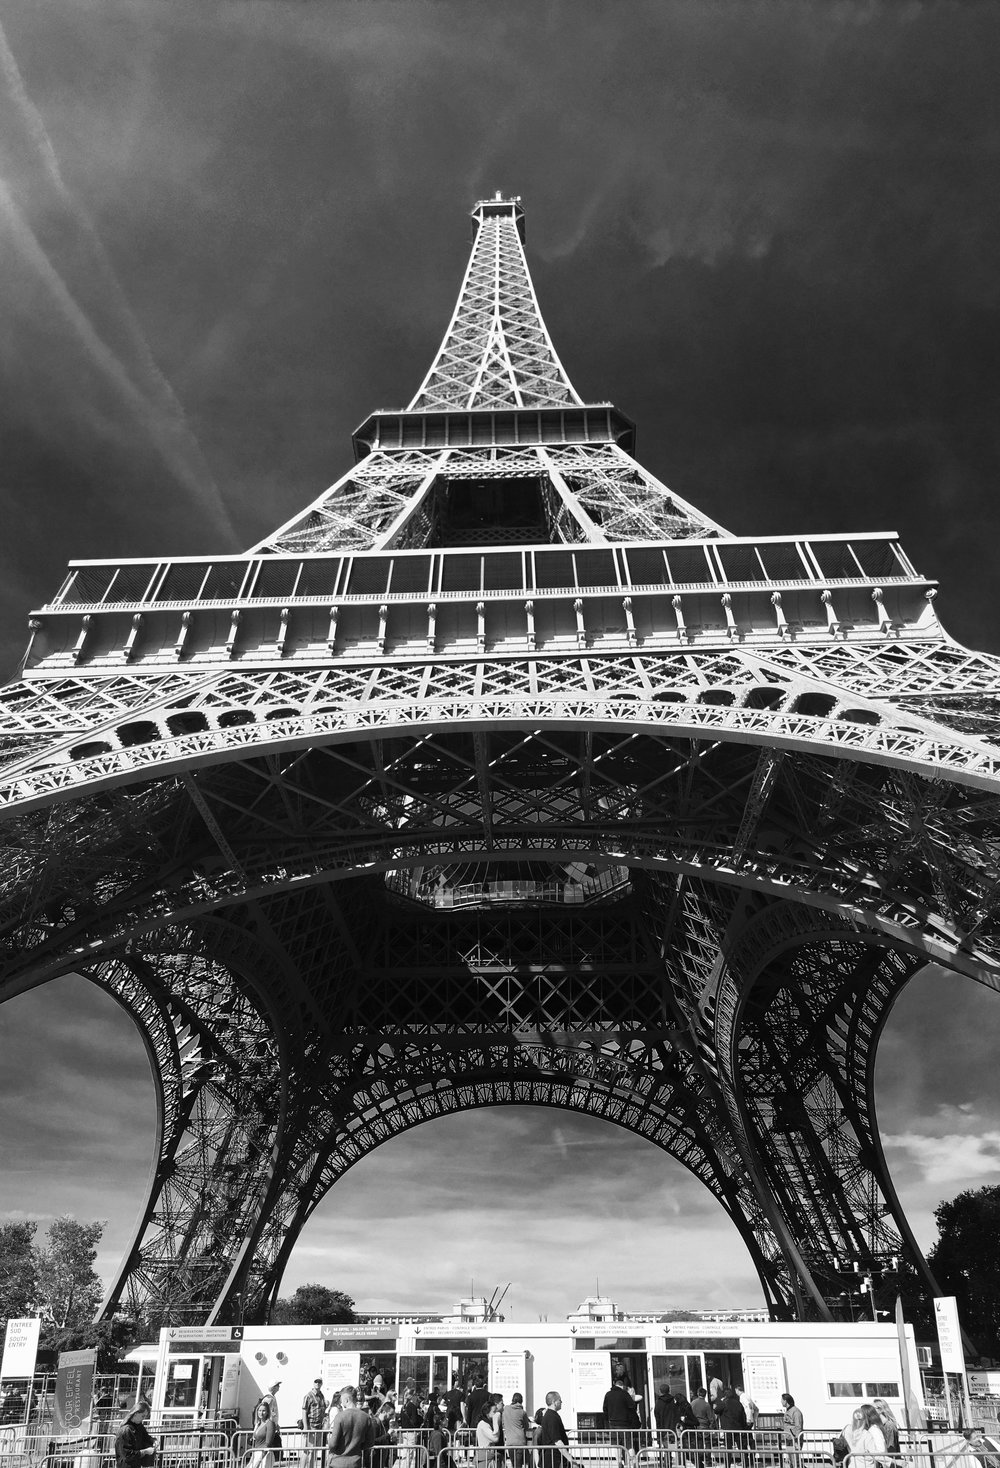 Tom_Oliver_Payne_London_to_Paris_Cycle-30.jpg